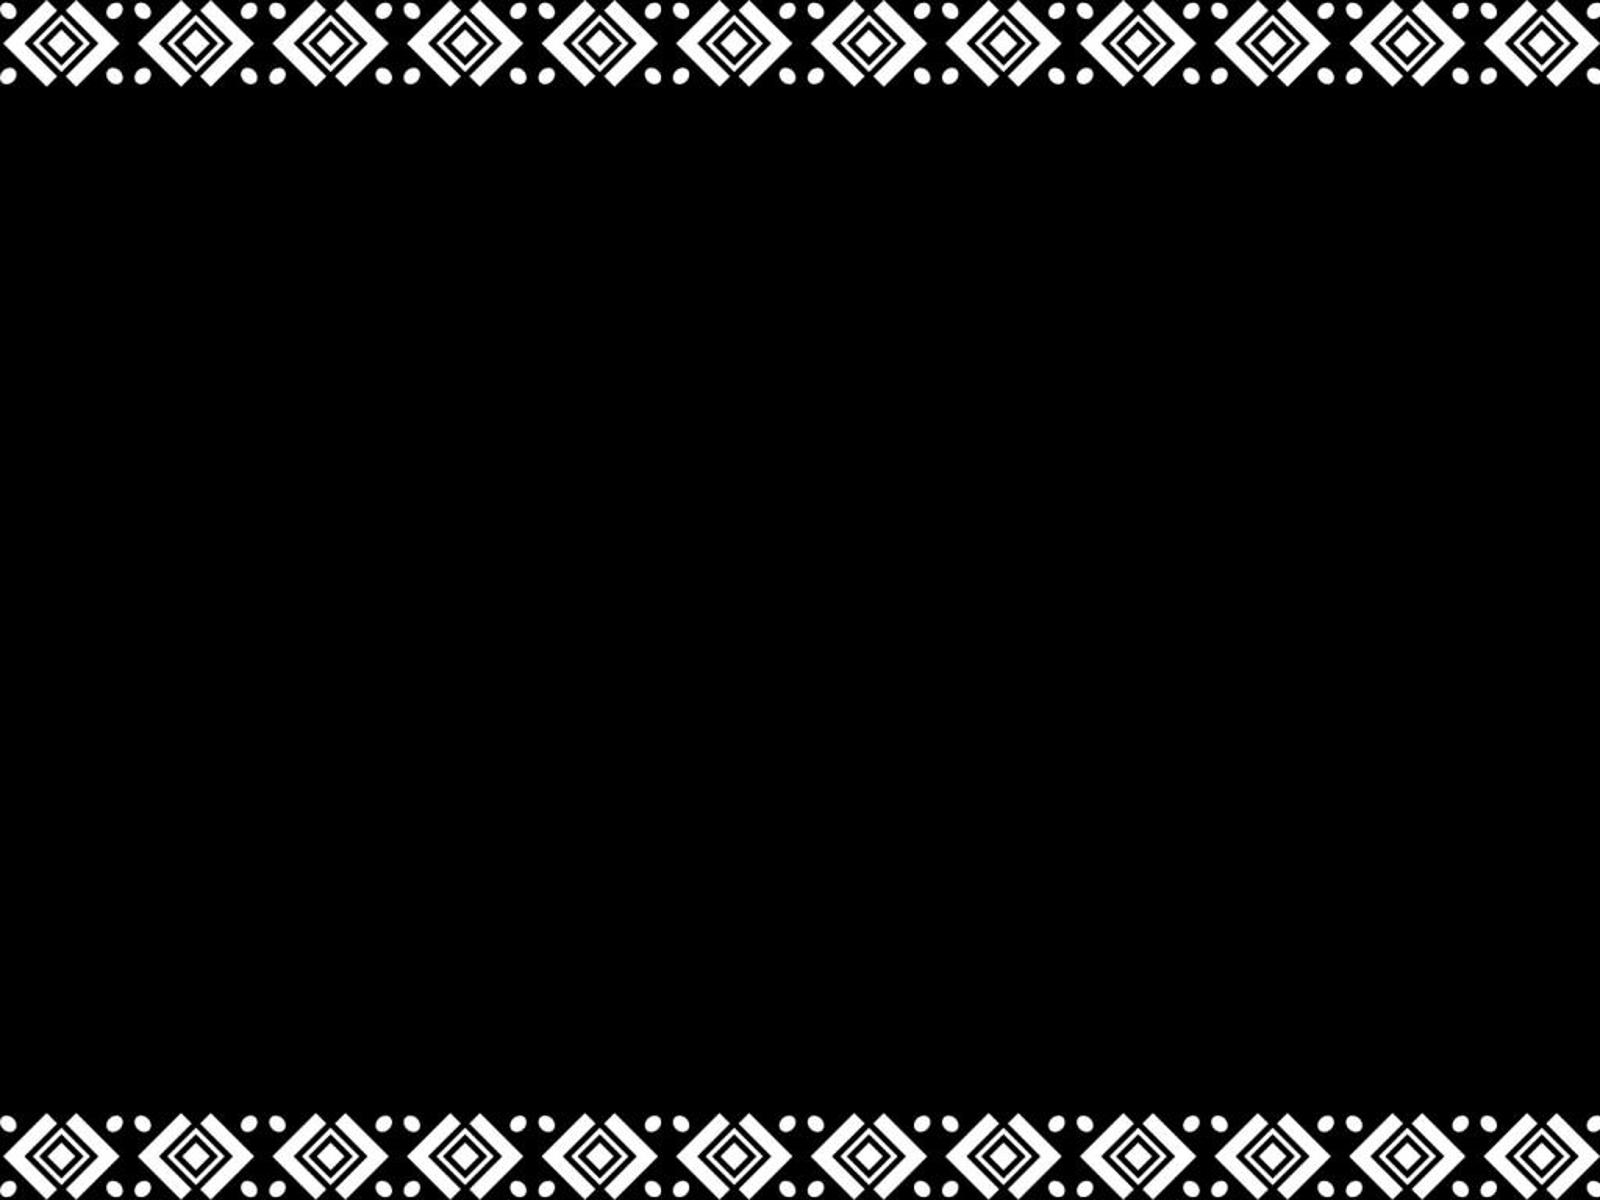 White Pattern Frame PPT Backgrounds